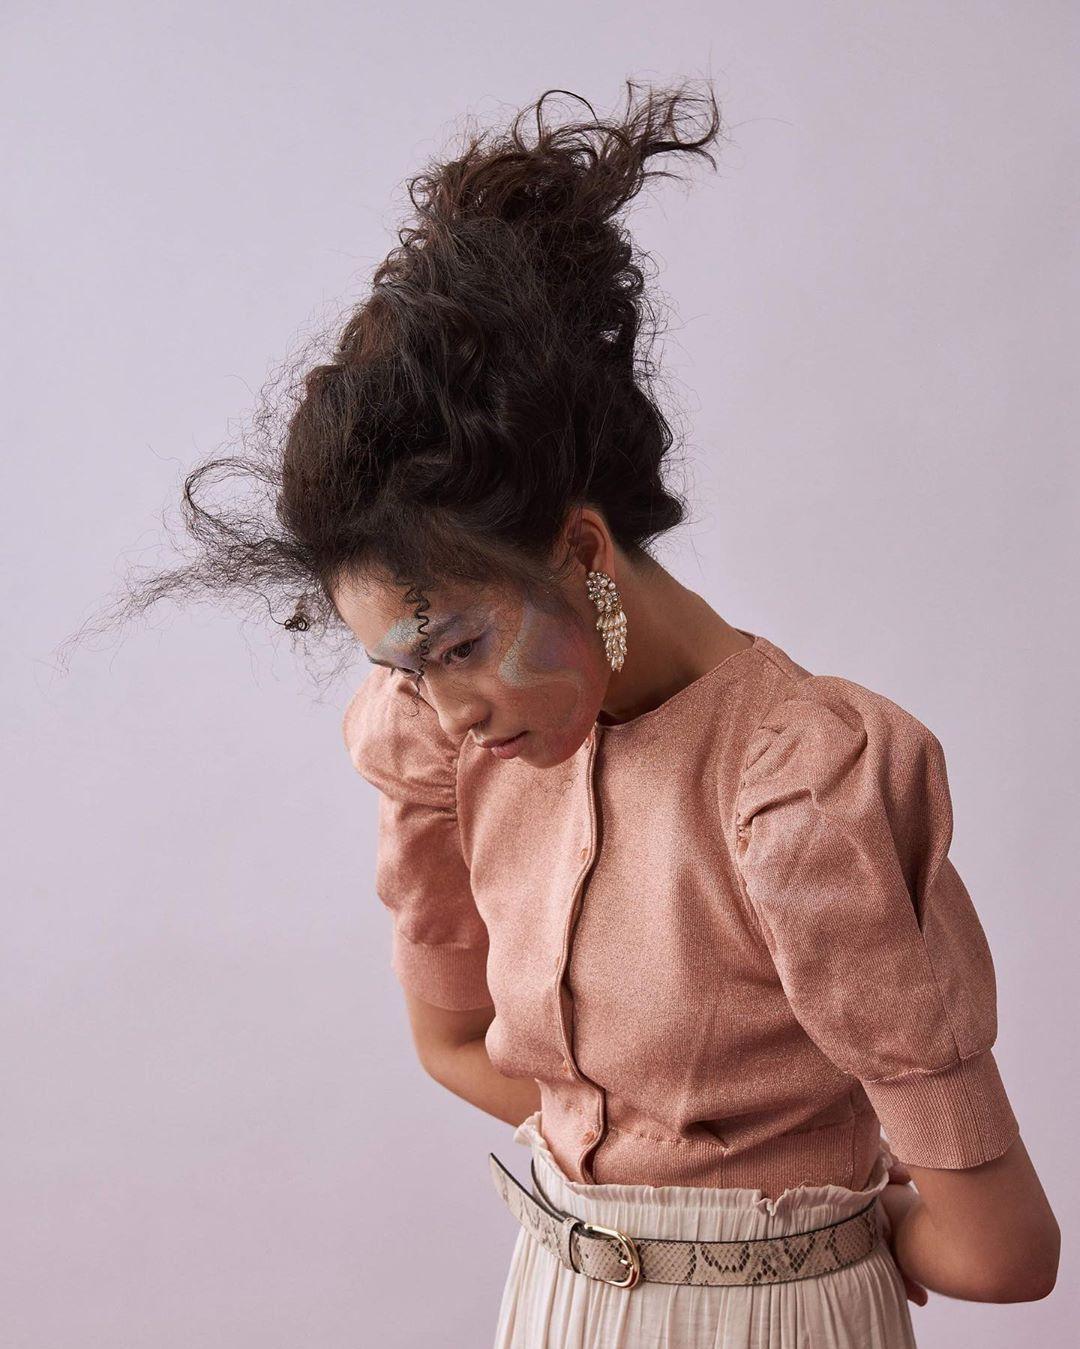 📷BE A _ GIRL👩🏻 Make up&Hair/ YUWEI LIU Styling/ NAIYU YU Model/ VERNA Shot by me.